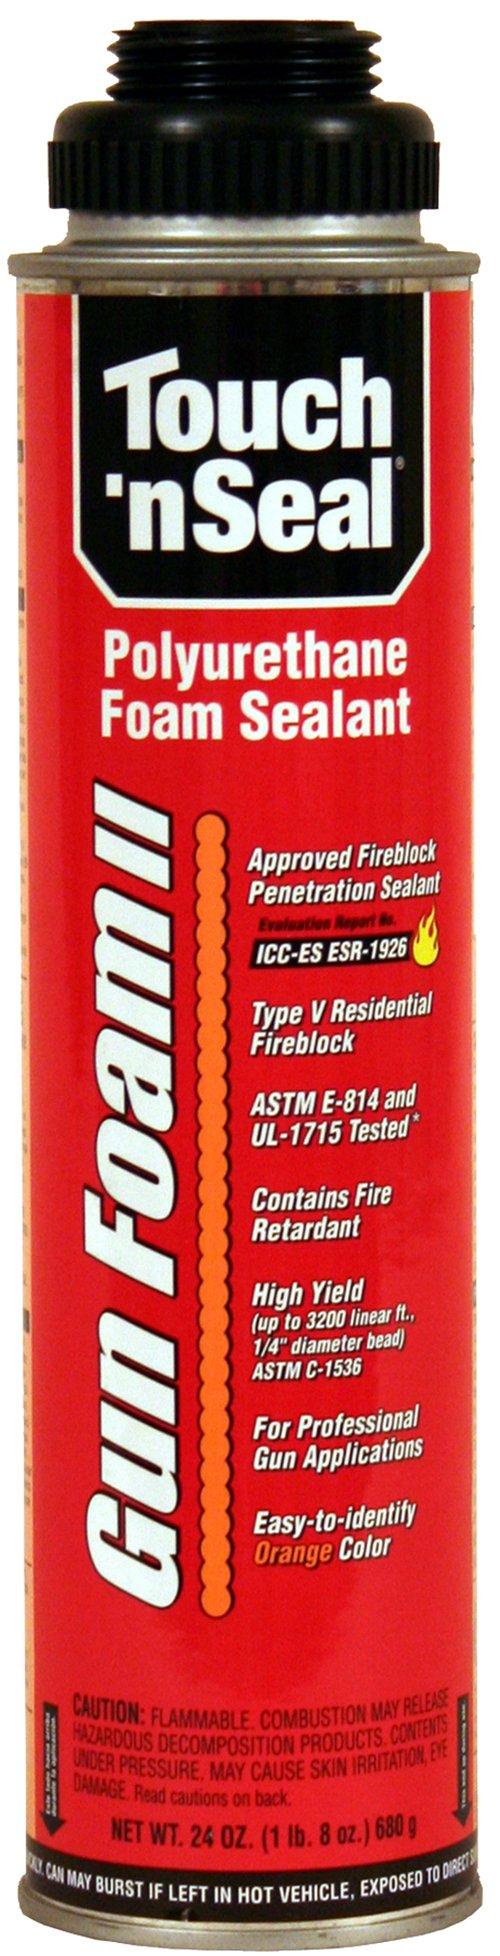 Touch 'n Seal Gun Foam II Fireblocking Polyurethane Foam Sealant, 24 oz Can, Orange